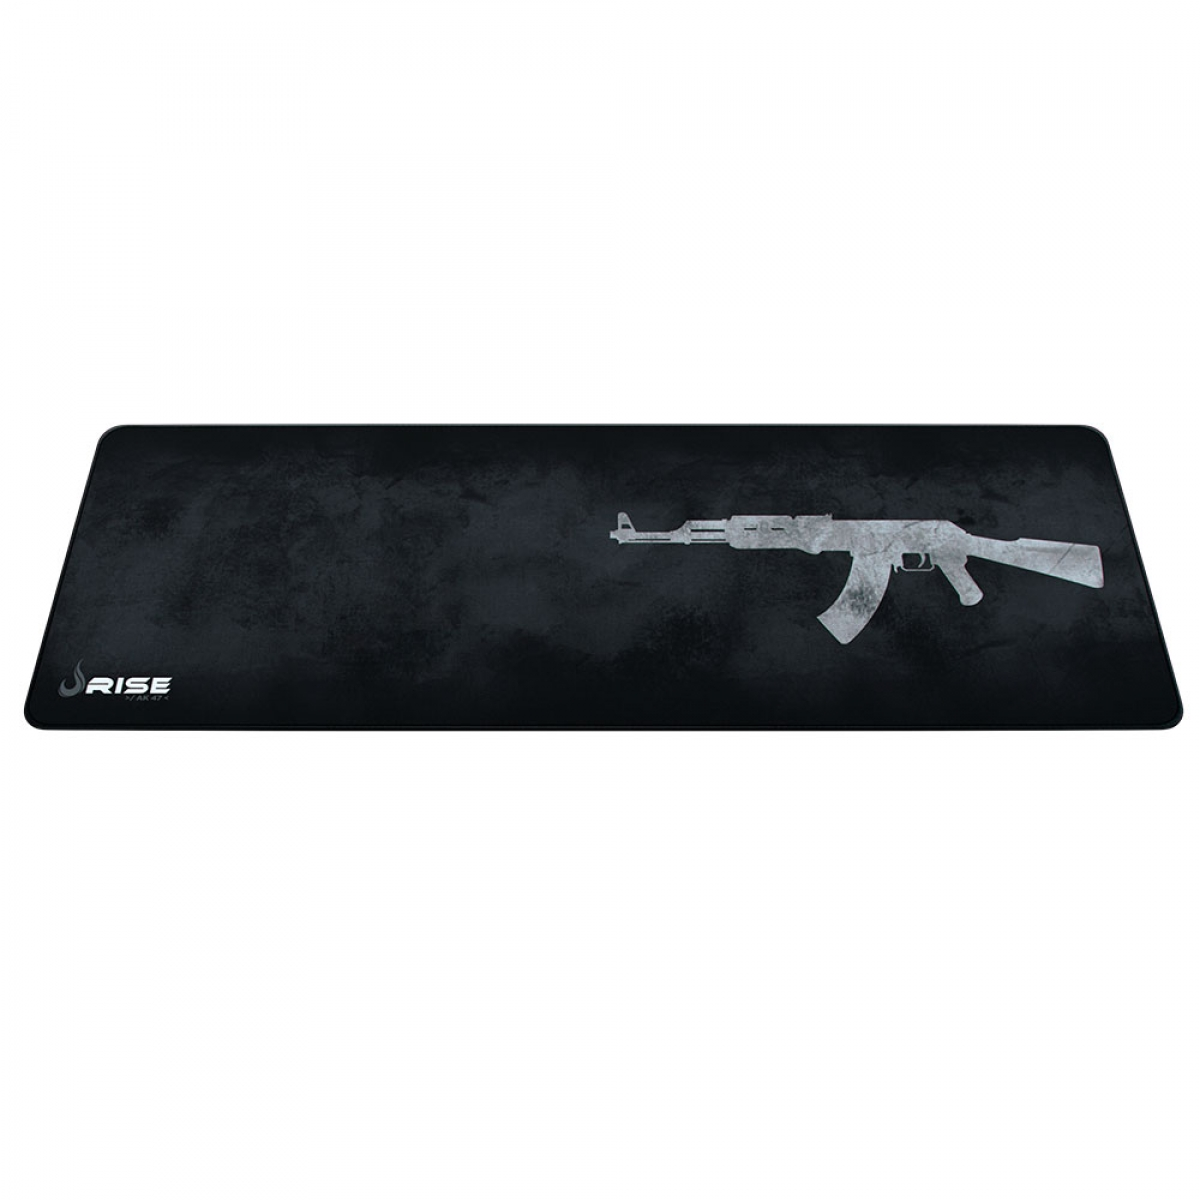 Mouse Pad Gamer Rise AK47 EXTENDED BORDA COSTURADA  RG-MP-06-AK